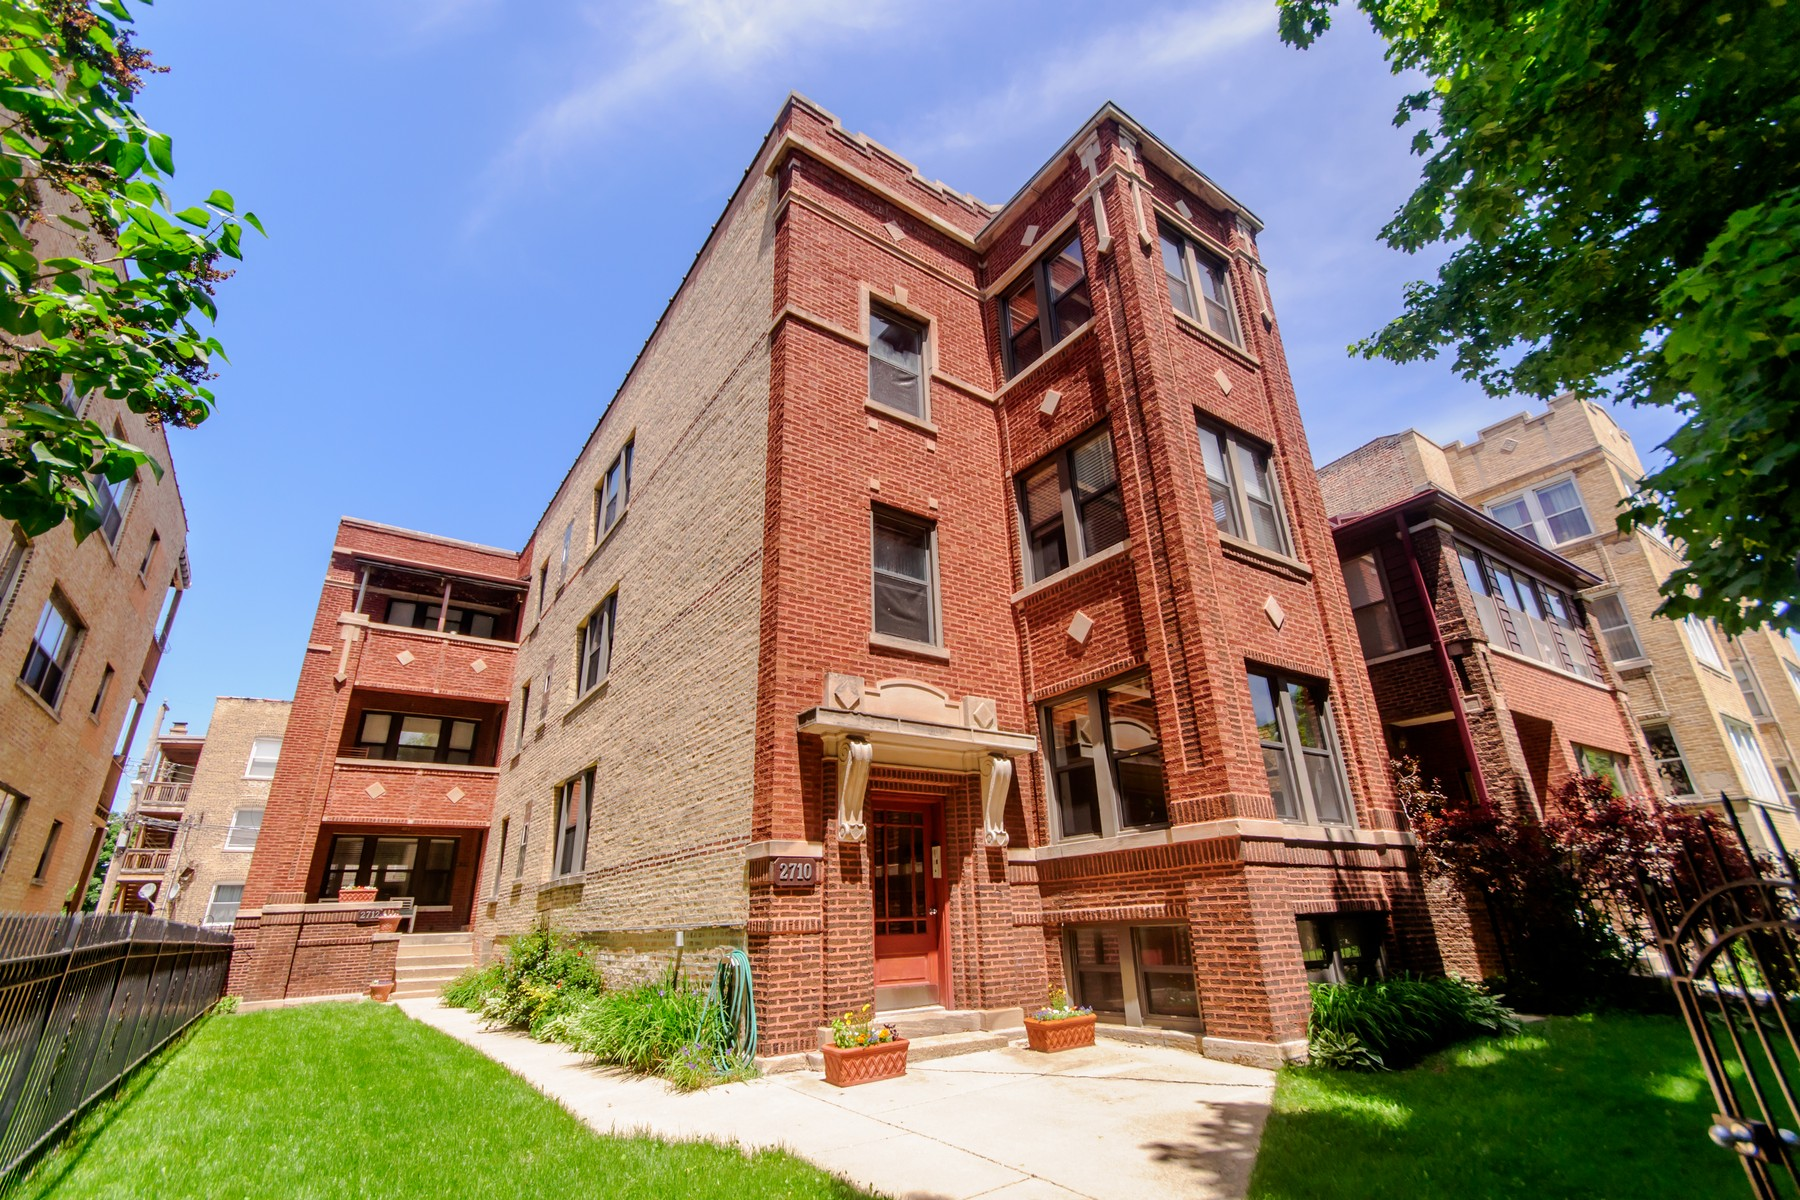 复式 为 销售 在 Ravenswood Gardens Duplex! 2710 W Leland Avenue Unit 1 Lincoln Square, 芝加哥, 伊利诺斯州, 60625 美国